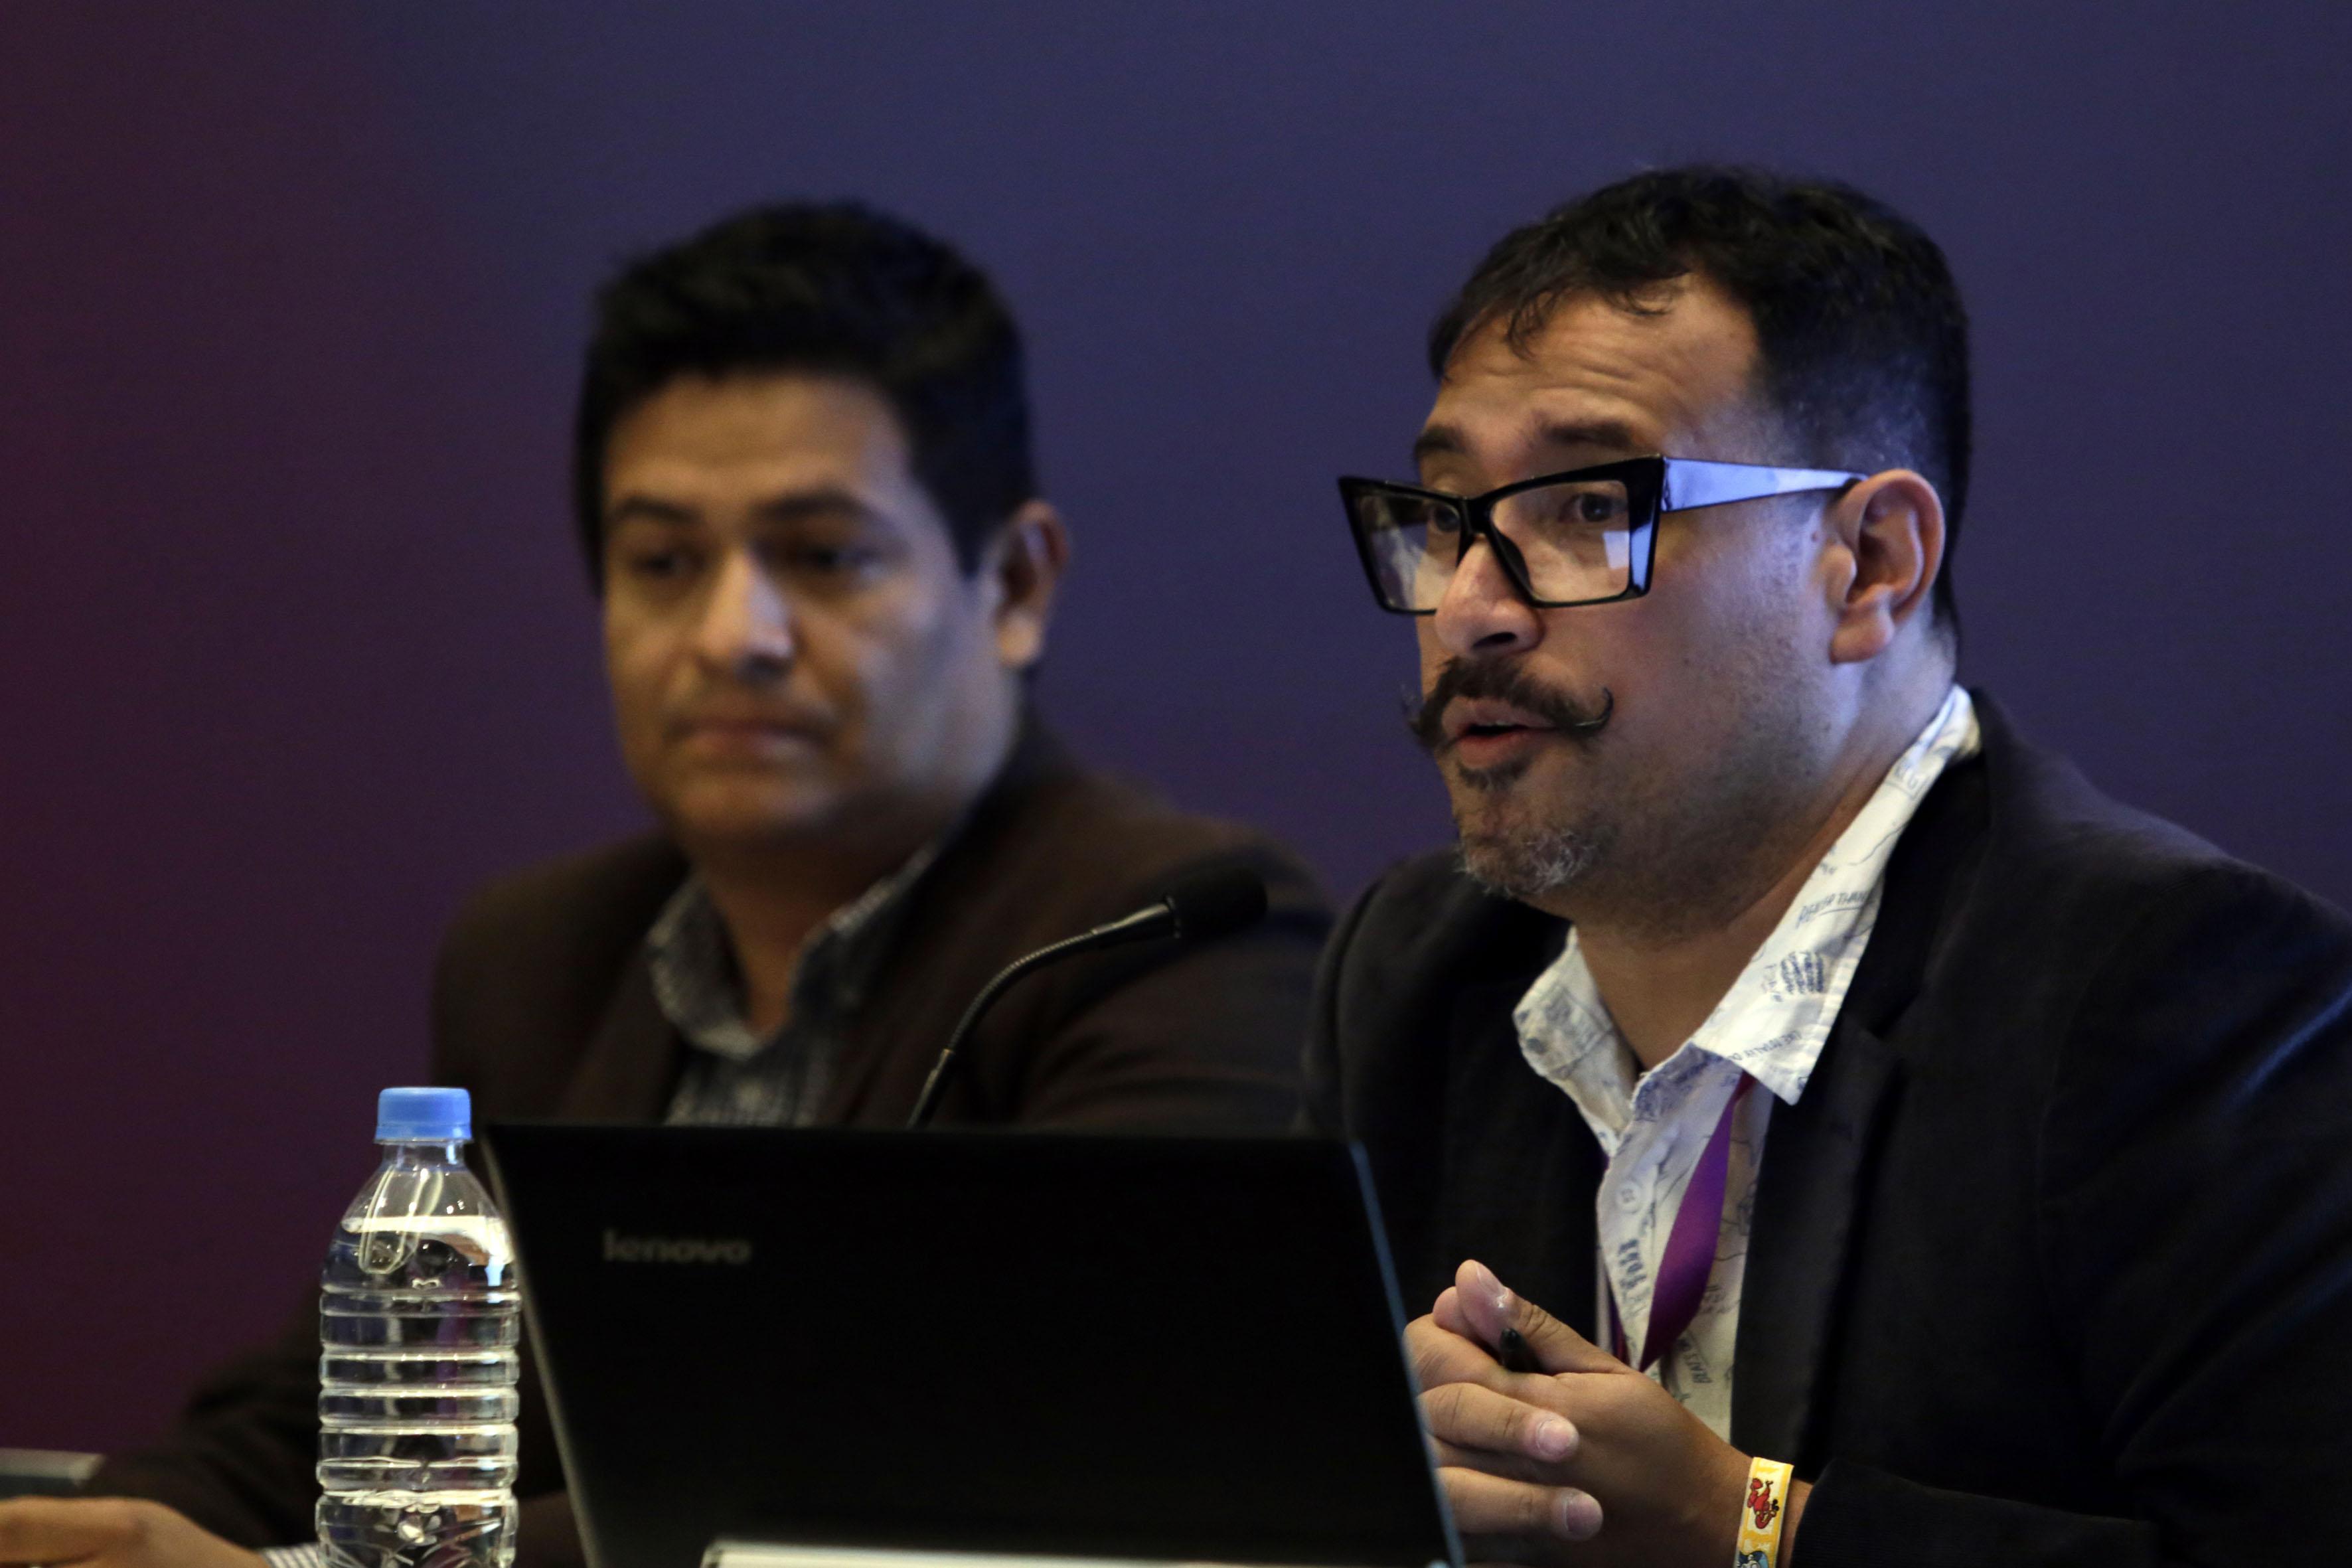 Caricaturista colombiano Nadim, participando en la mesa inaugural, como parte del Encuentro Internacional de Caricatura e Historieta